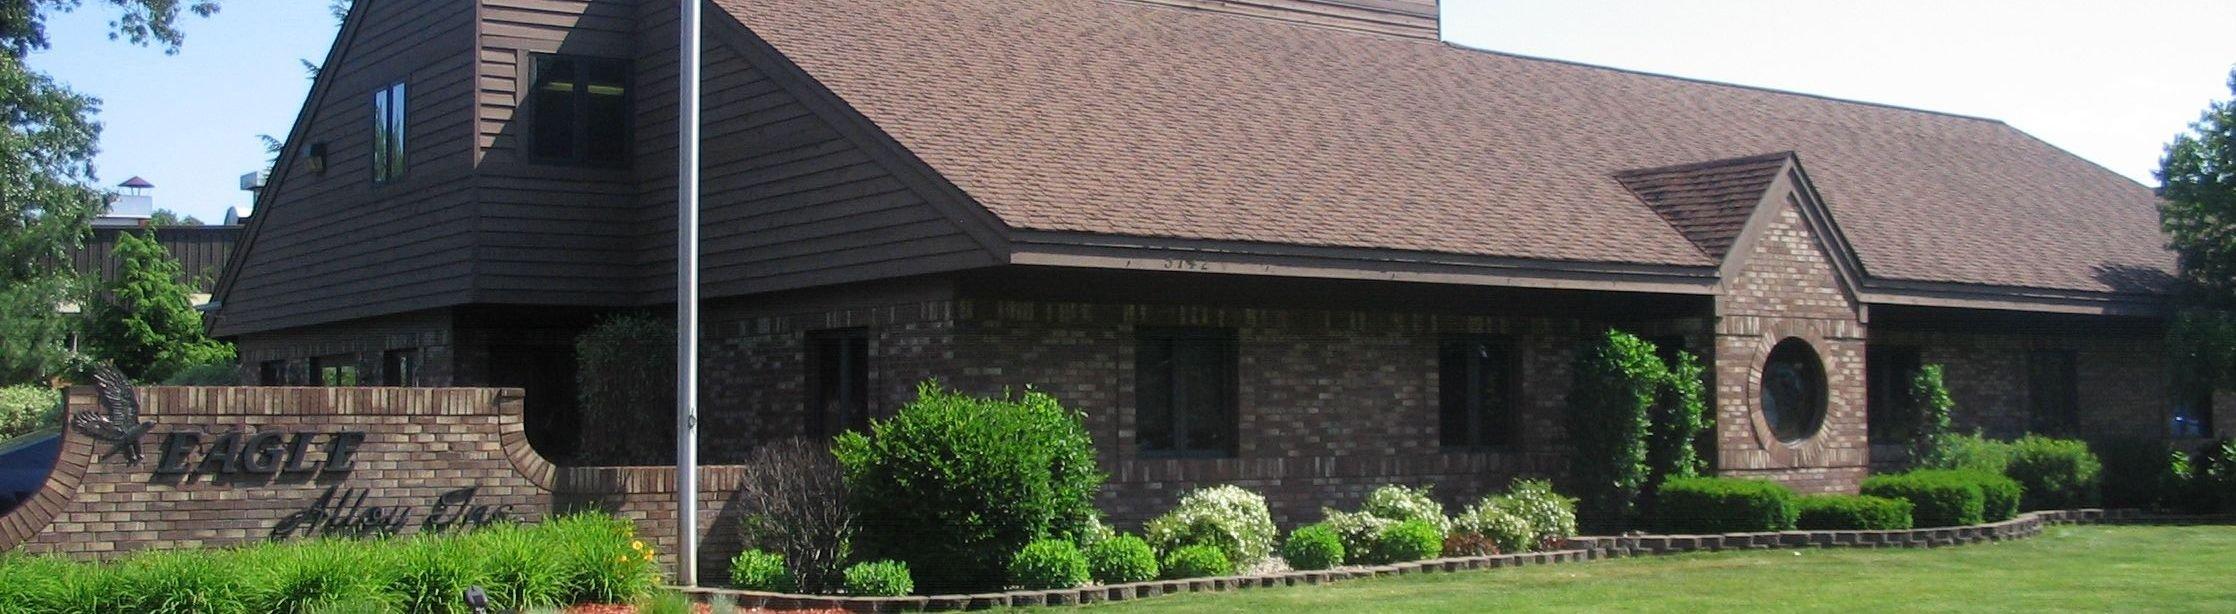 The Eagle Group - Eagle Alloy Office, Muskegon, MI